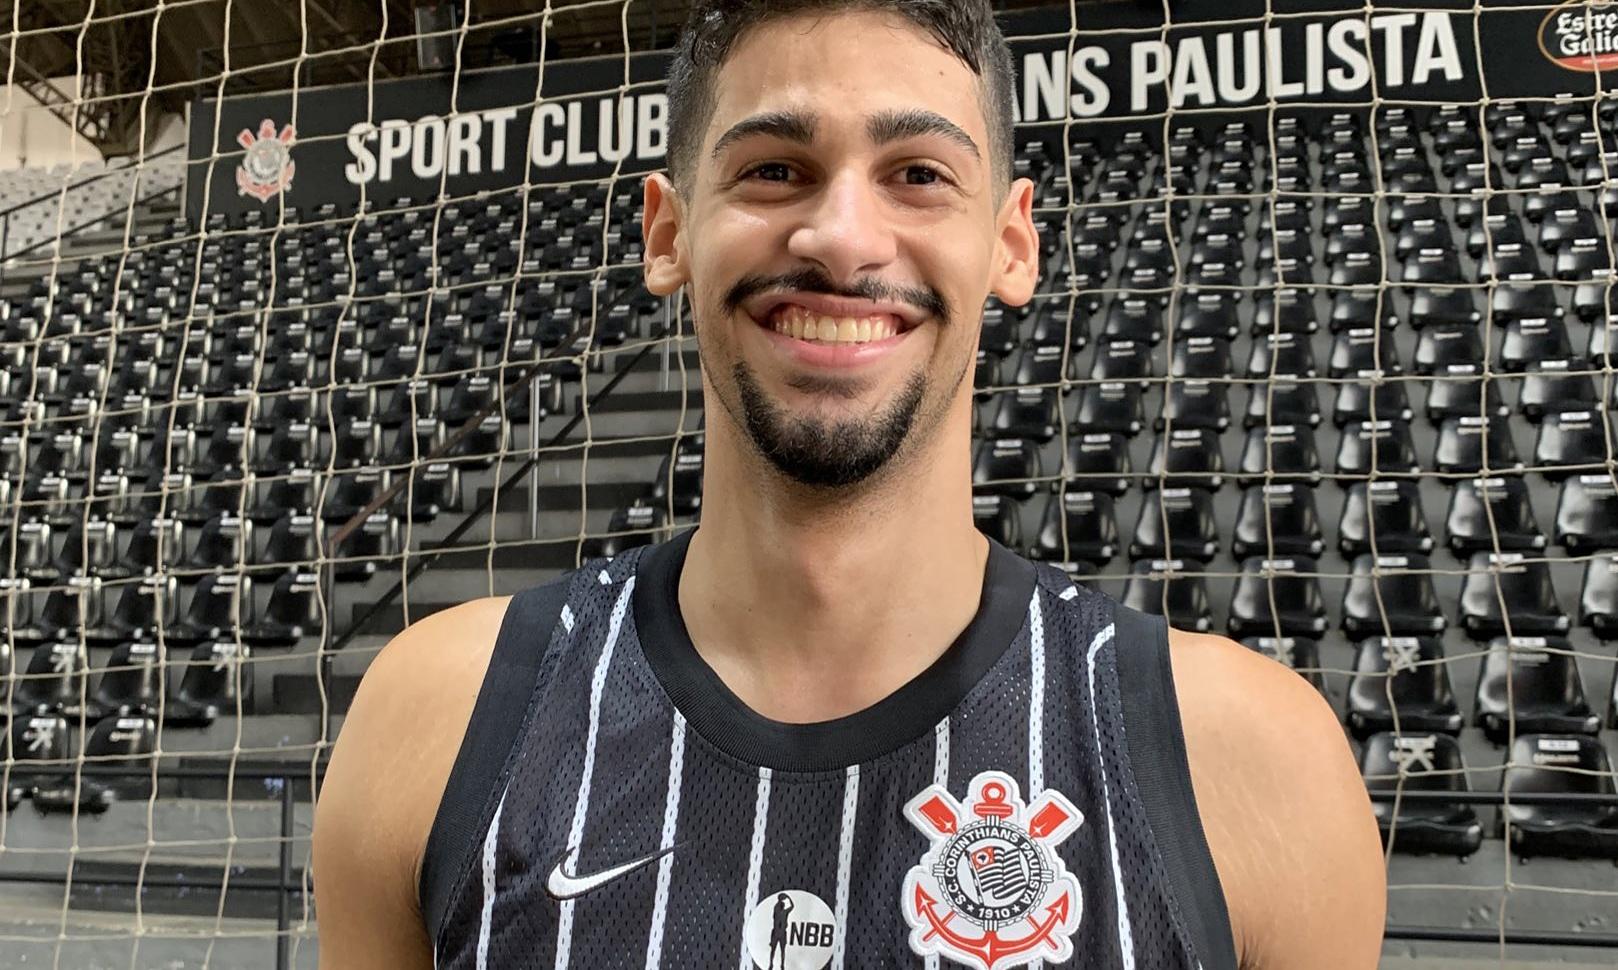 Pedro Nunes Corinthians basquete masculino nbb Flamengo